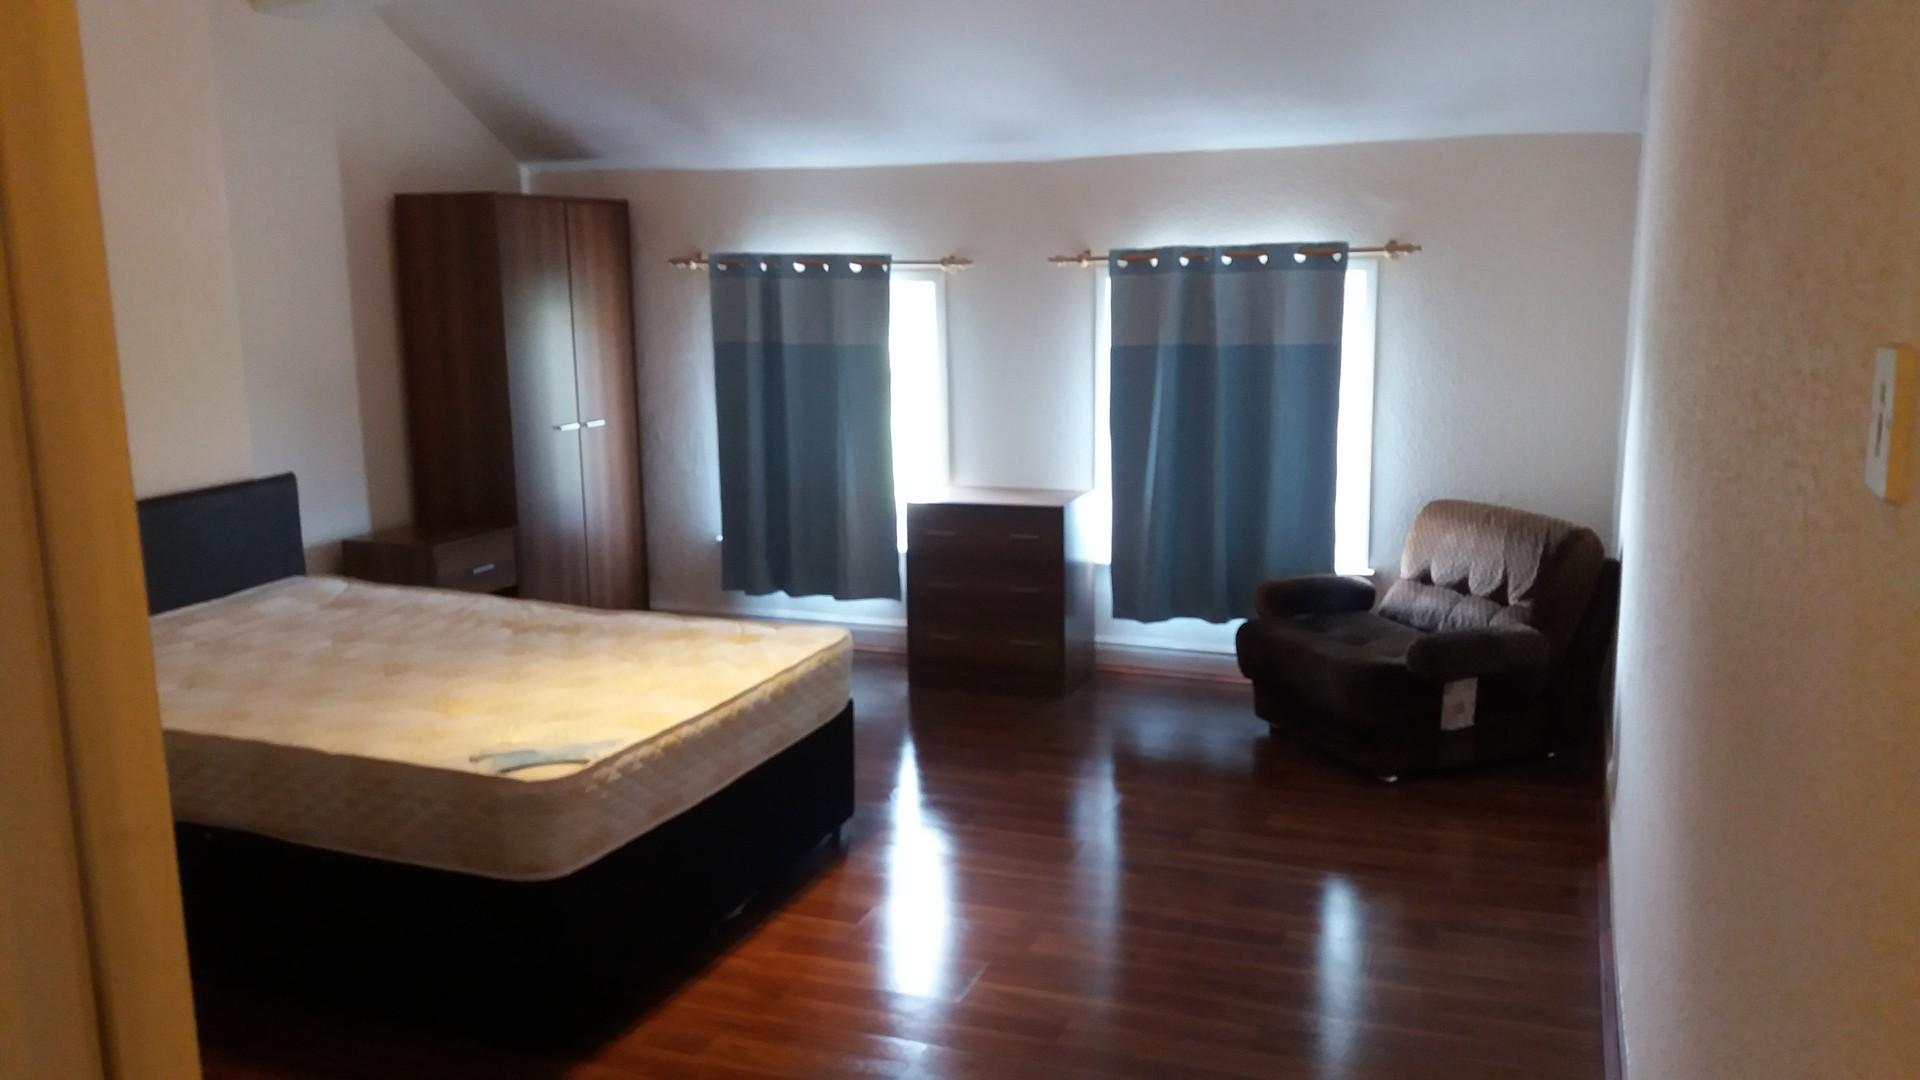 newly-refurbished-4-double-bedrooms-l7-a20c0c250d7bfadf36a6a43c992e227b